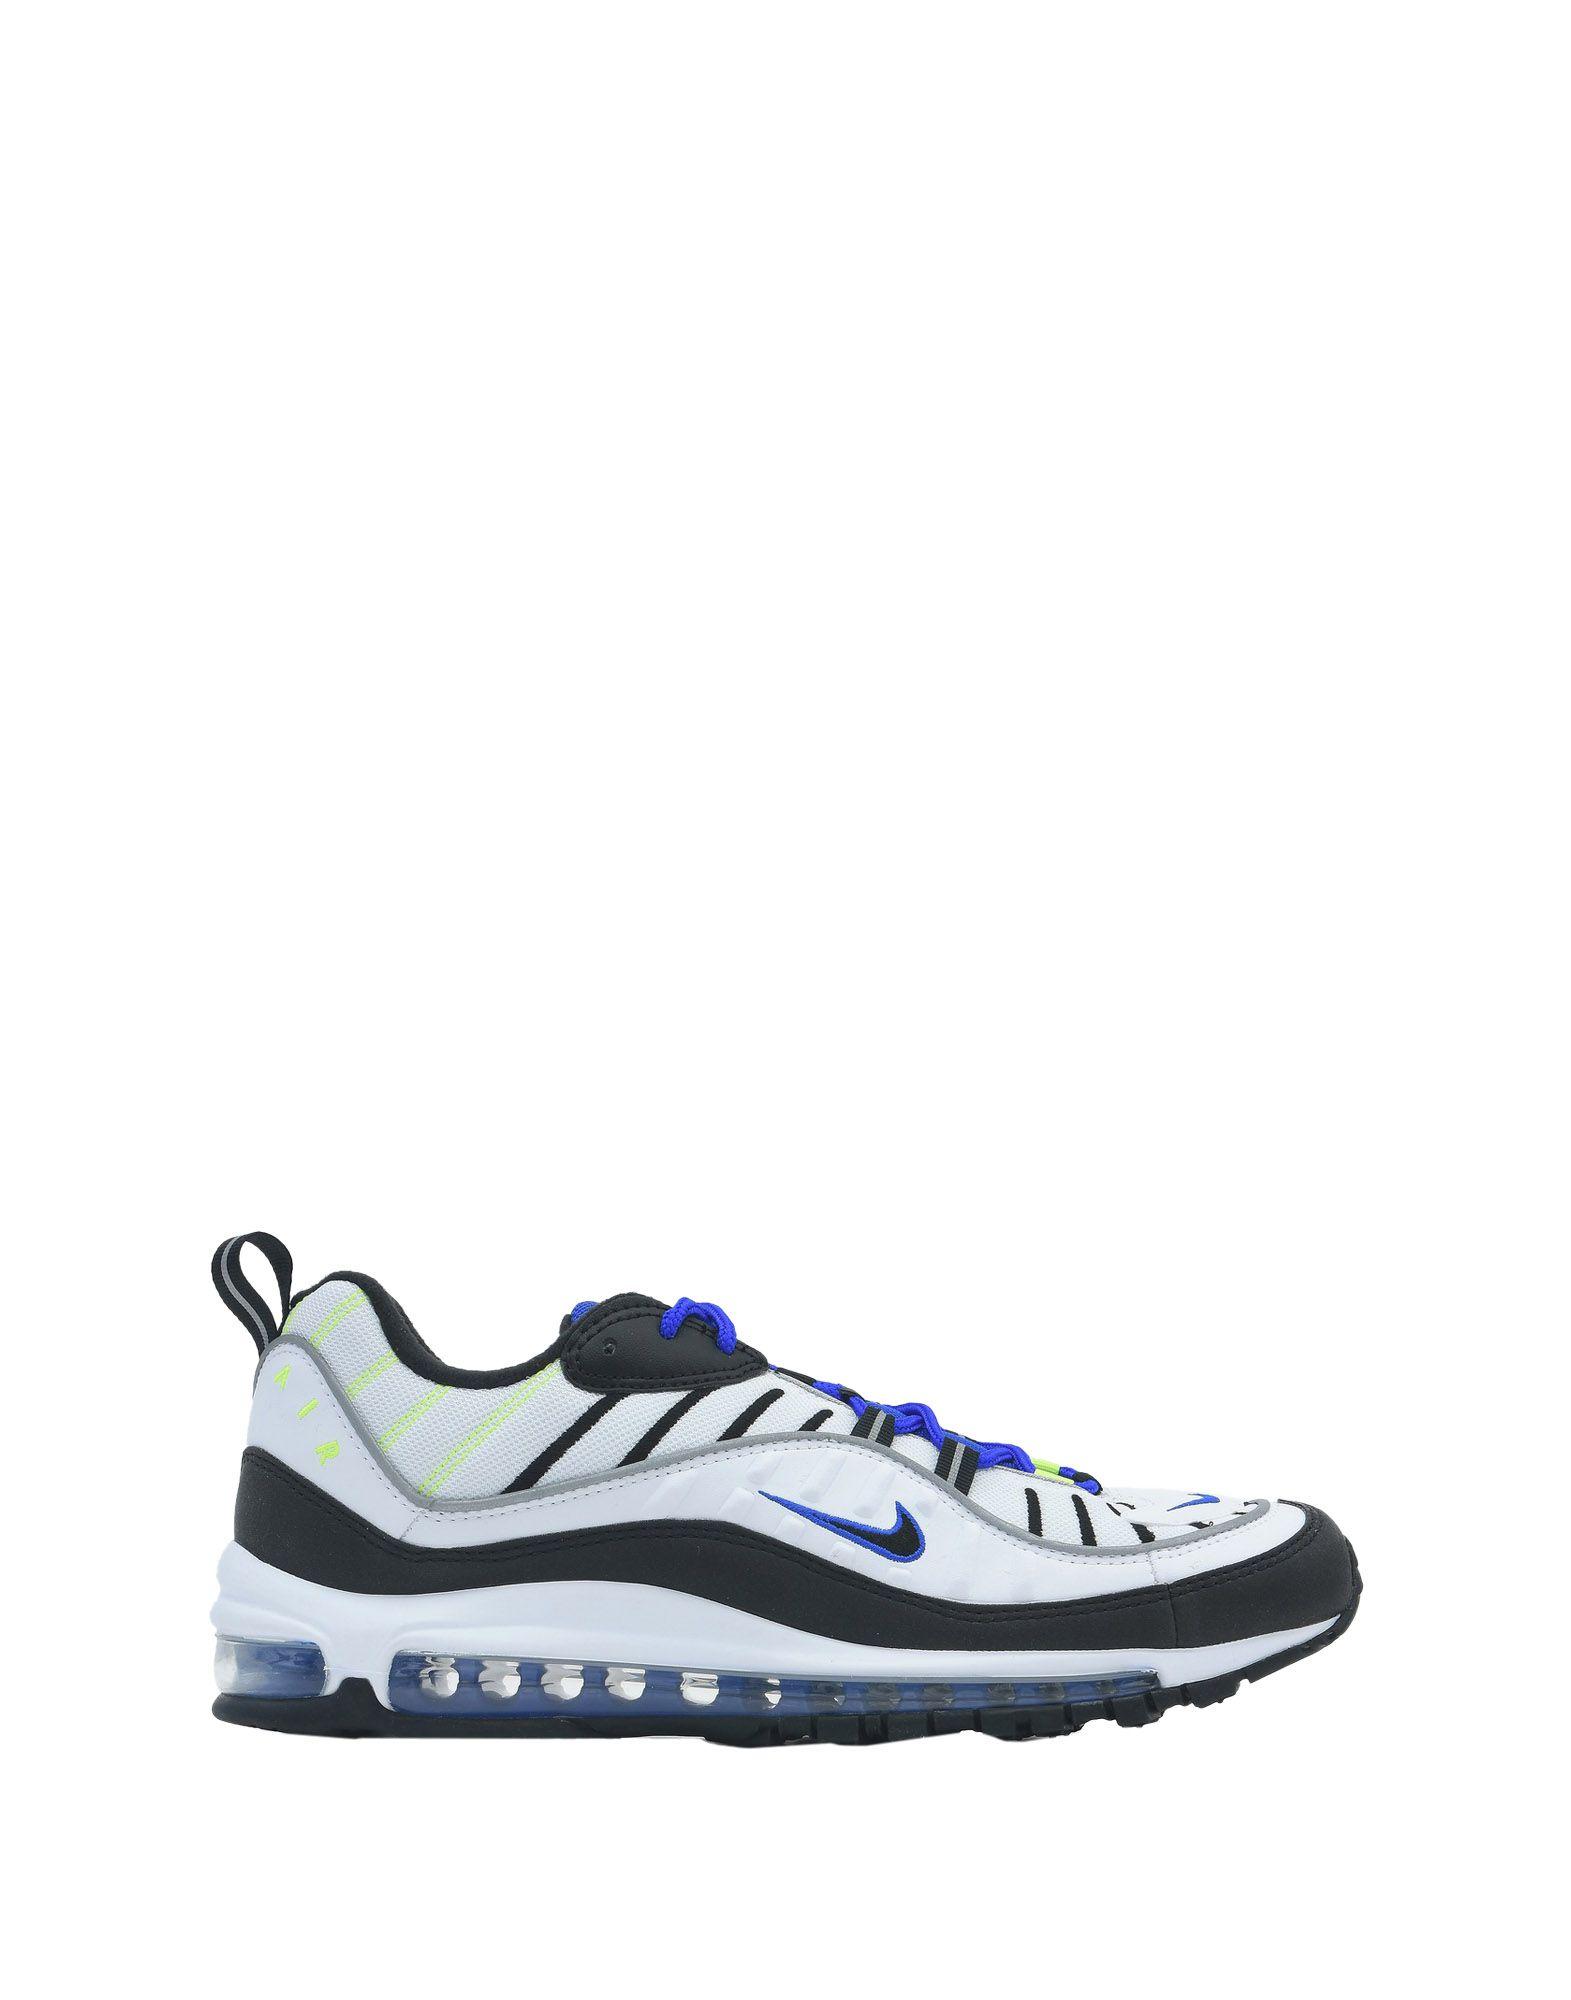 Scarpe da Ginnastica - Nike  Air Max 98 - Ginnastica Uomo - 11504712TT f2018d